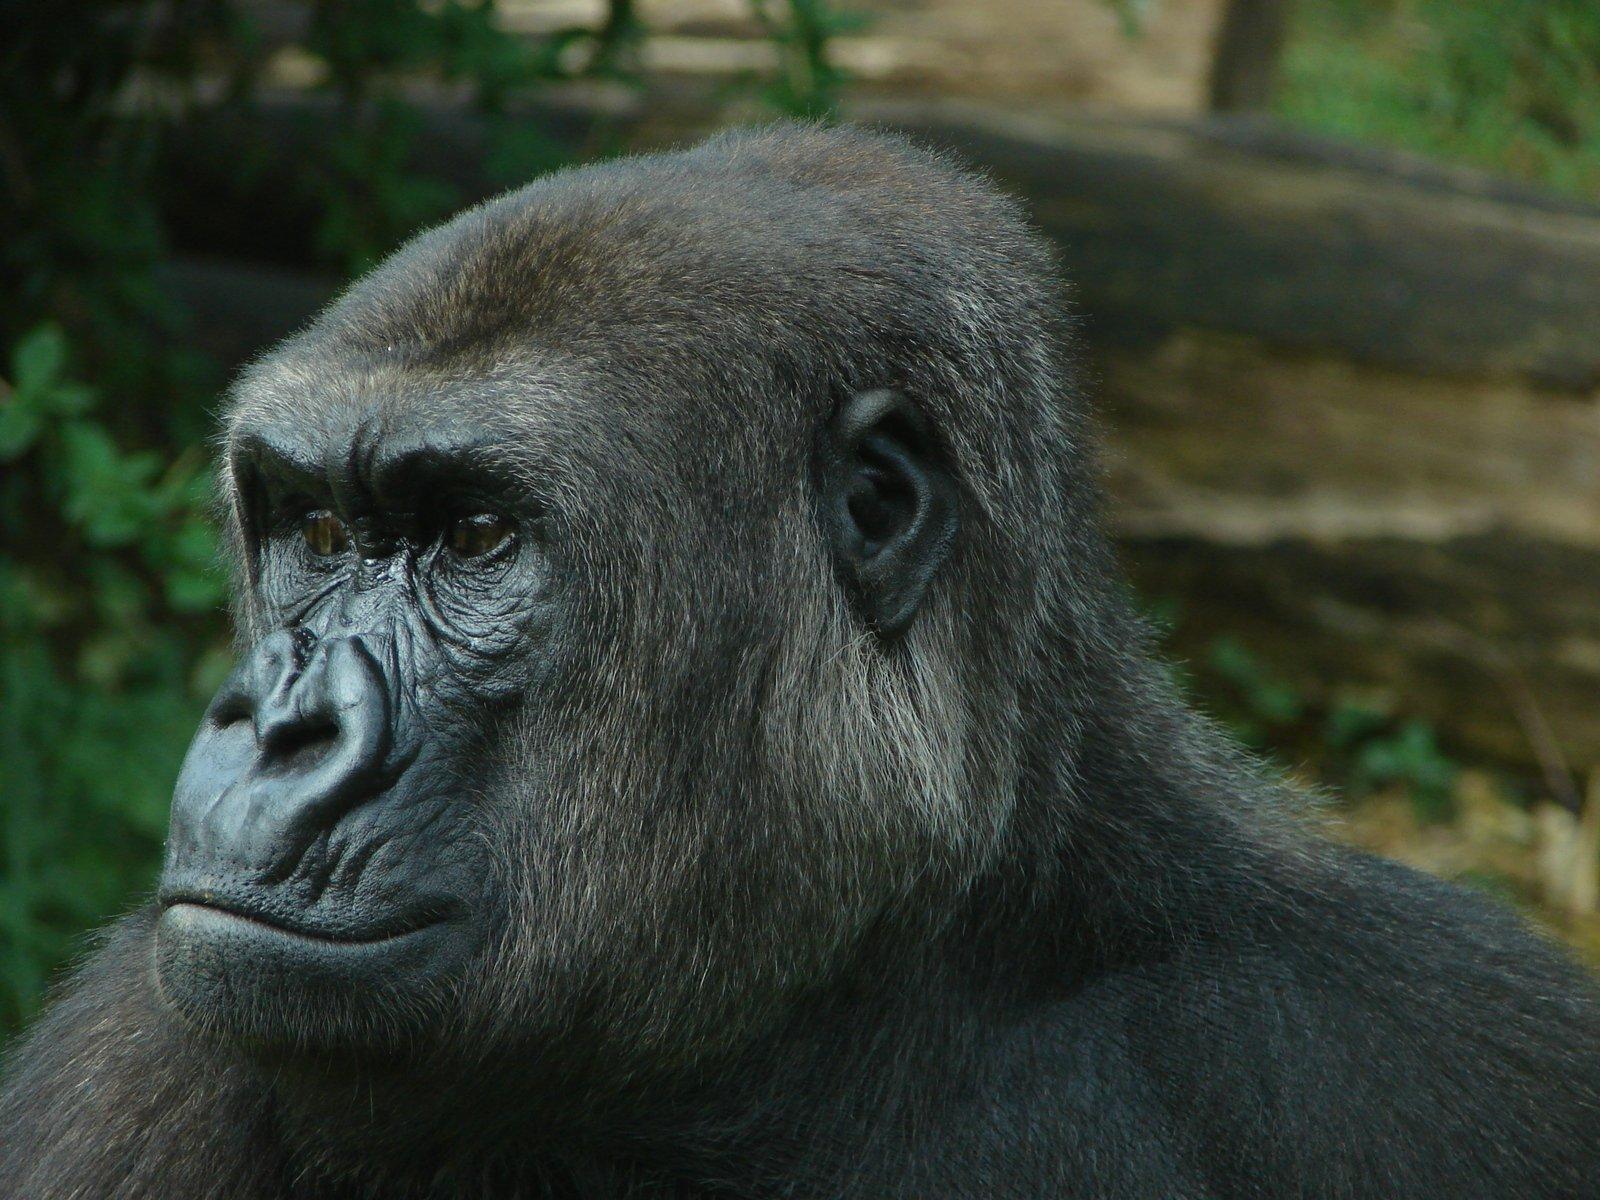 Free Gorilla Head Stock Photo - FreeImages.com